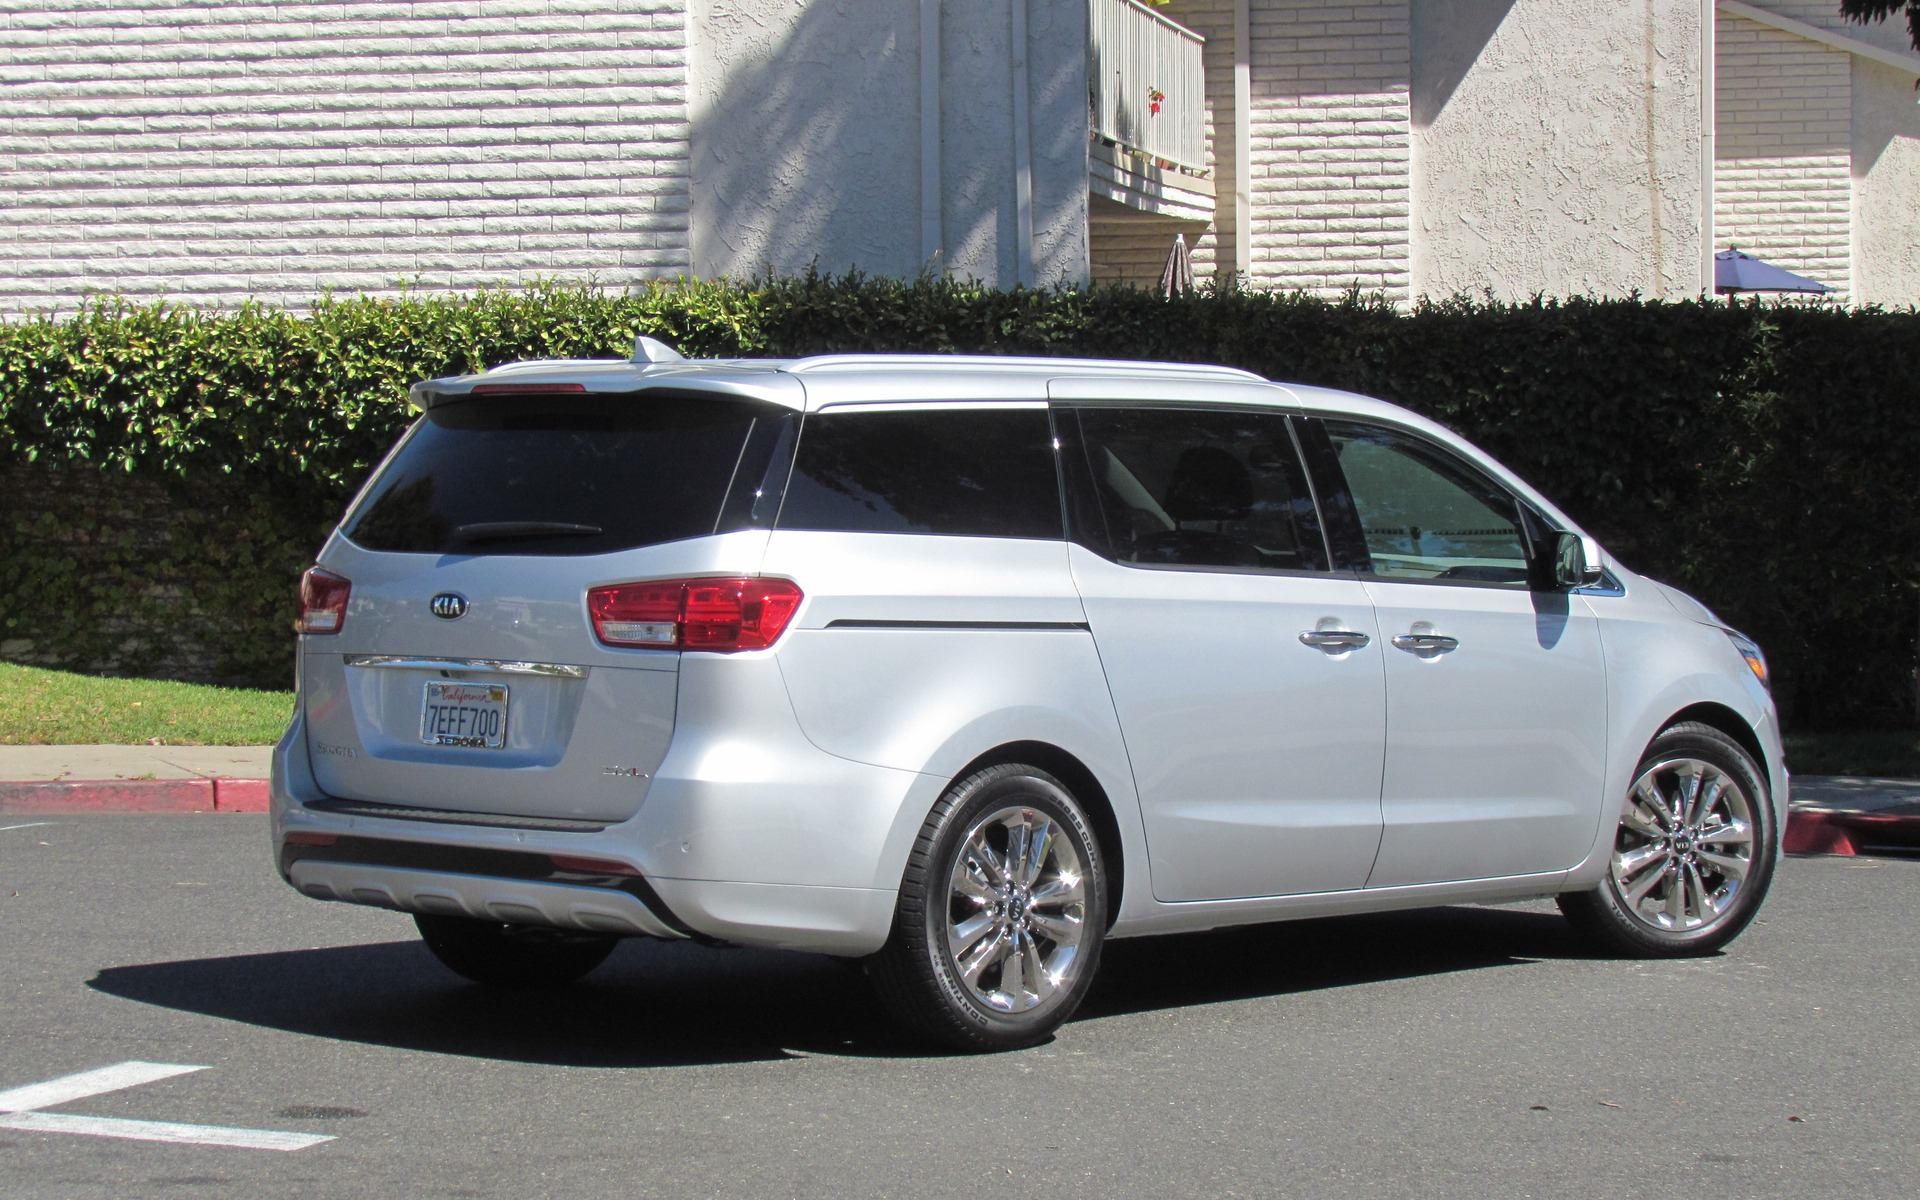 2015 kia sedona the minivan that isn t review the car guide. Black Bedroom Furniture Sets. Home Design Ideas